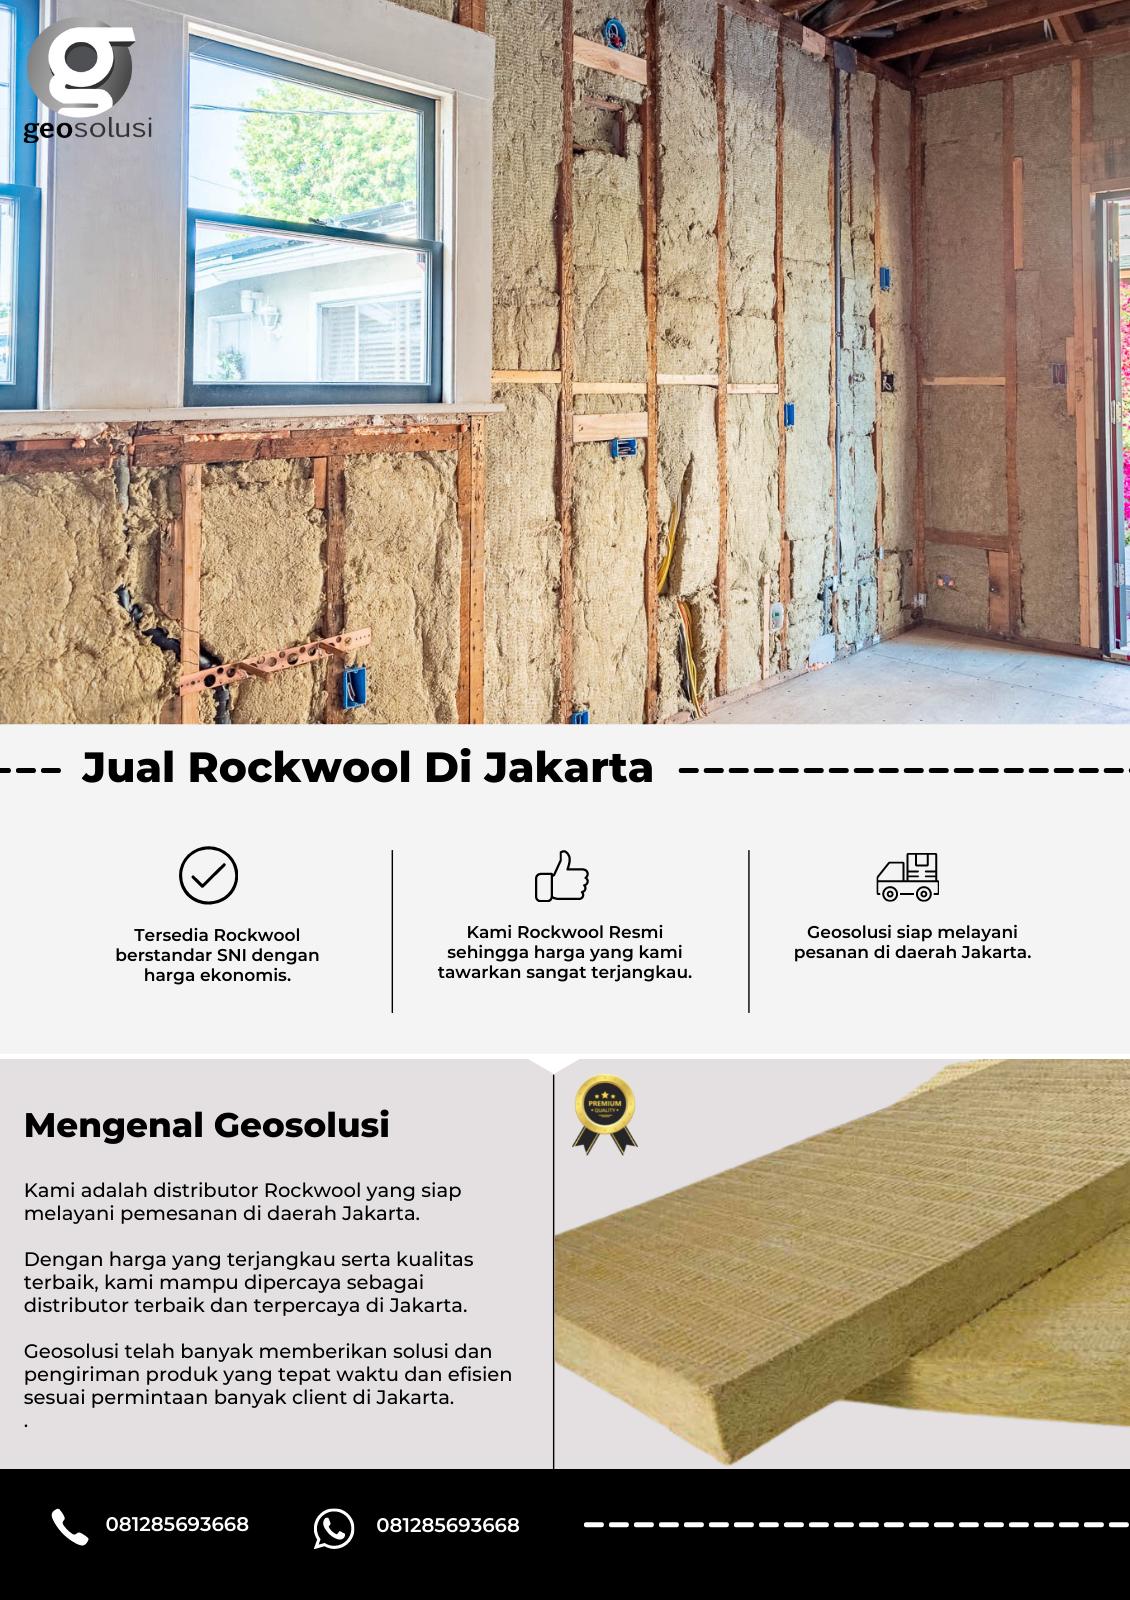 Jual Rockwool Di Jakarta